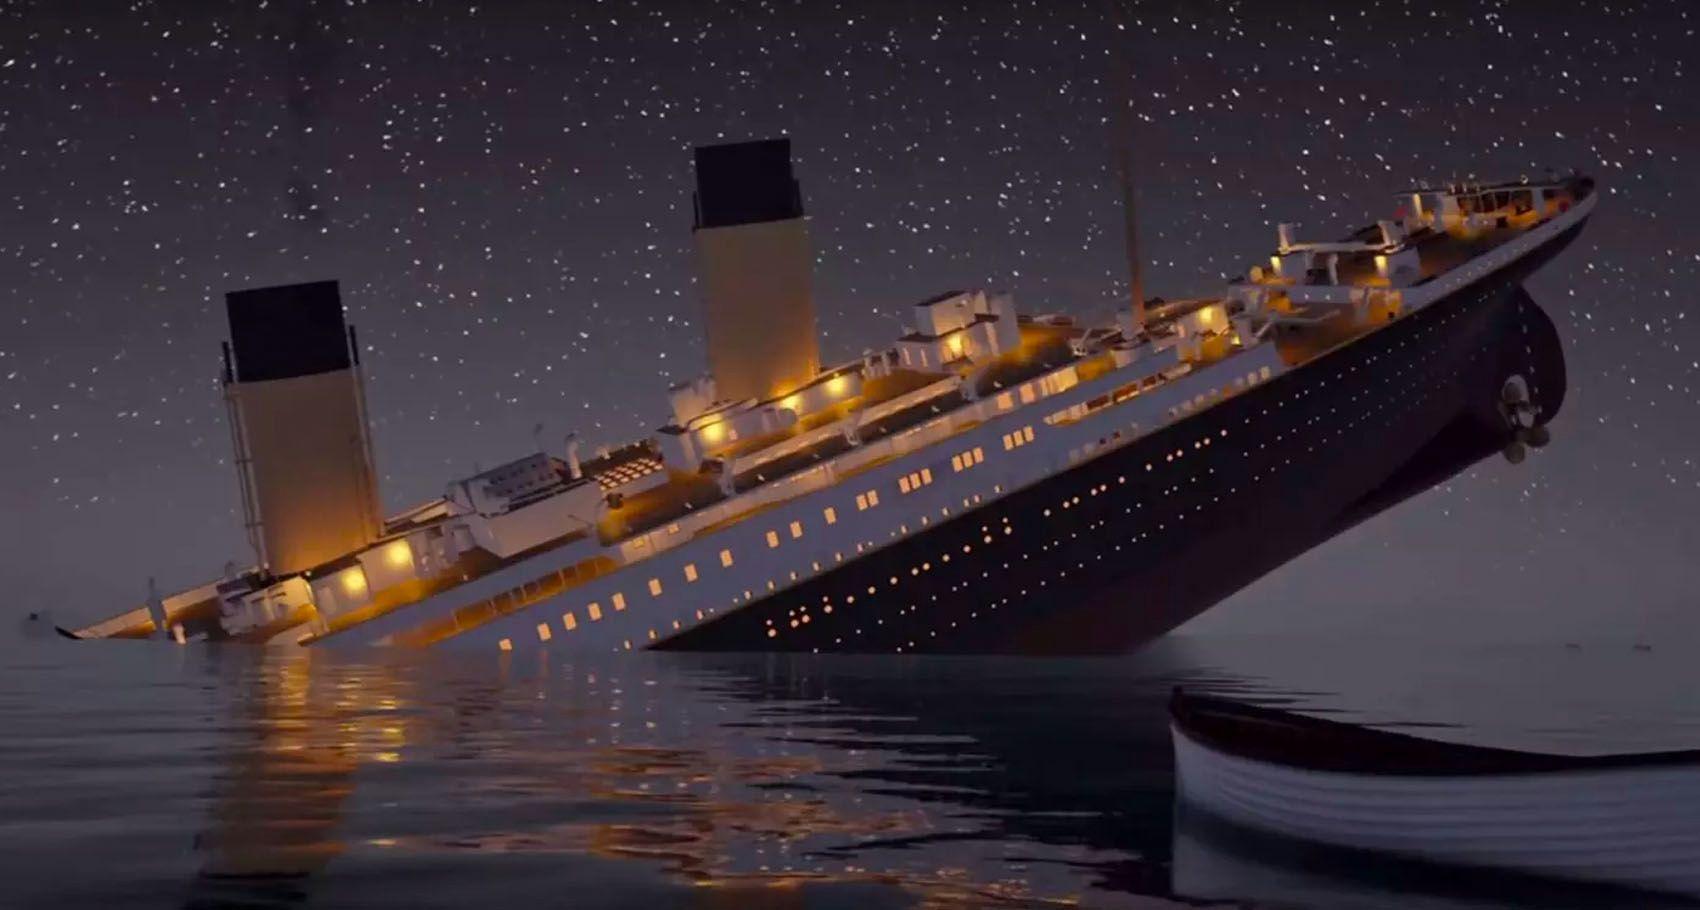 Titanic II Set To Trace Original 1912 Route in 2022 ...